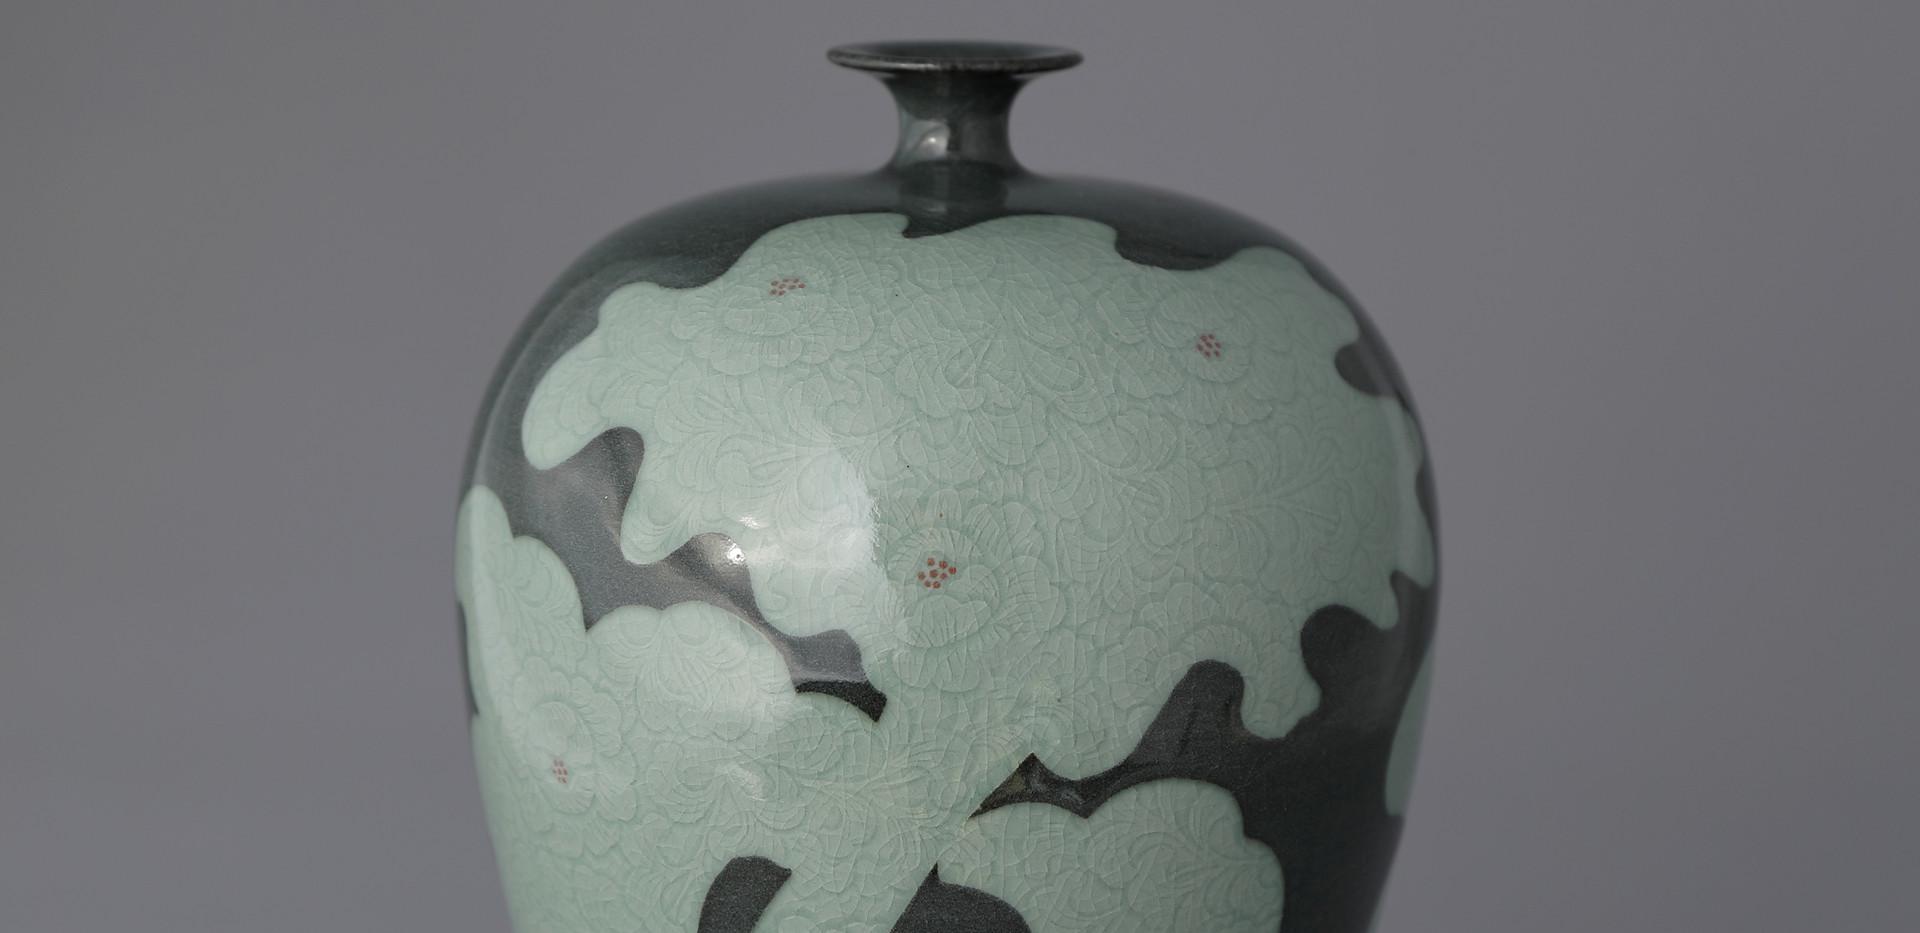 Celadon Sgraffito Bottle with Peony Decoration, 2000